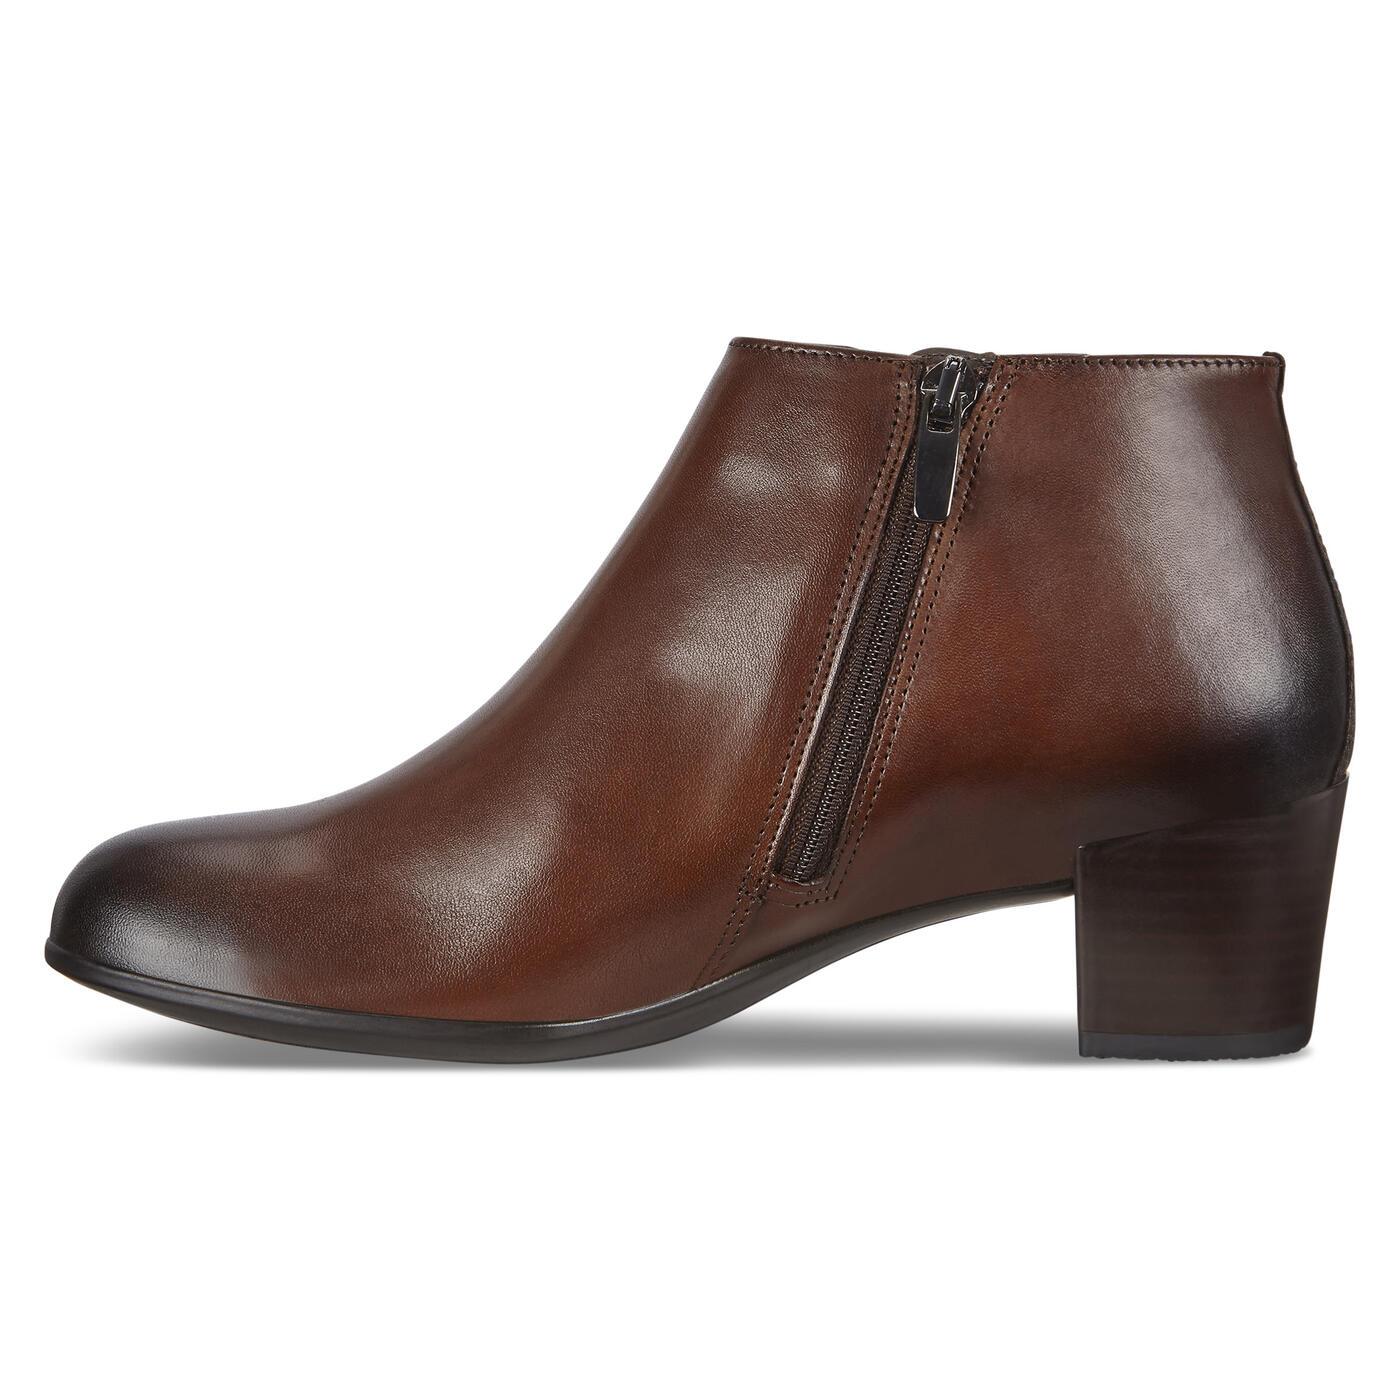 ECCO Shape M 35 Women's Ankle Boot